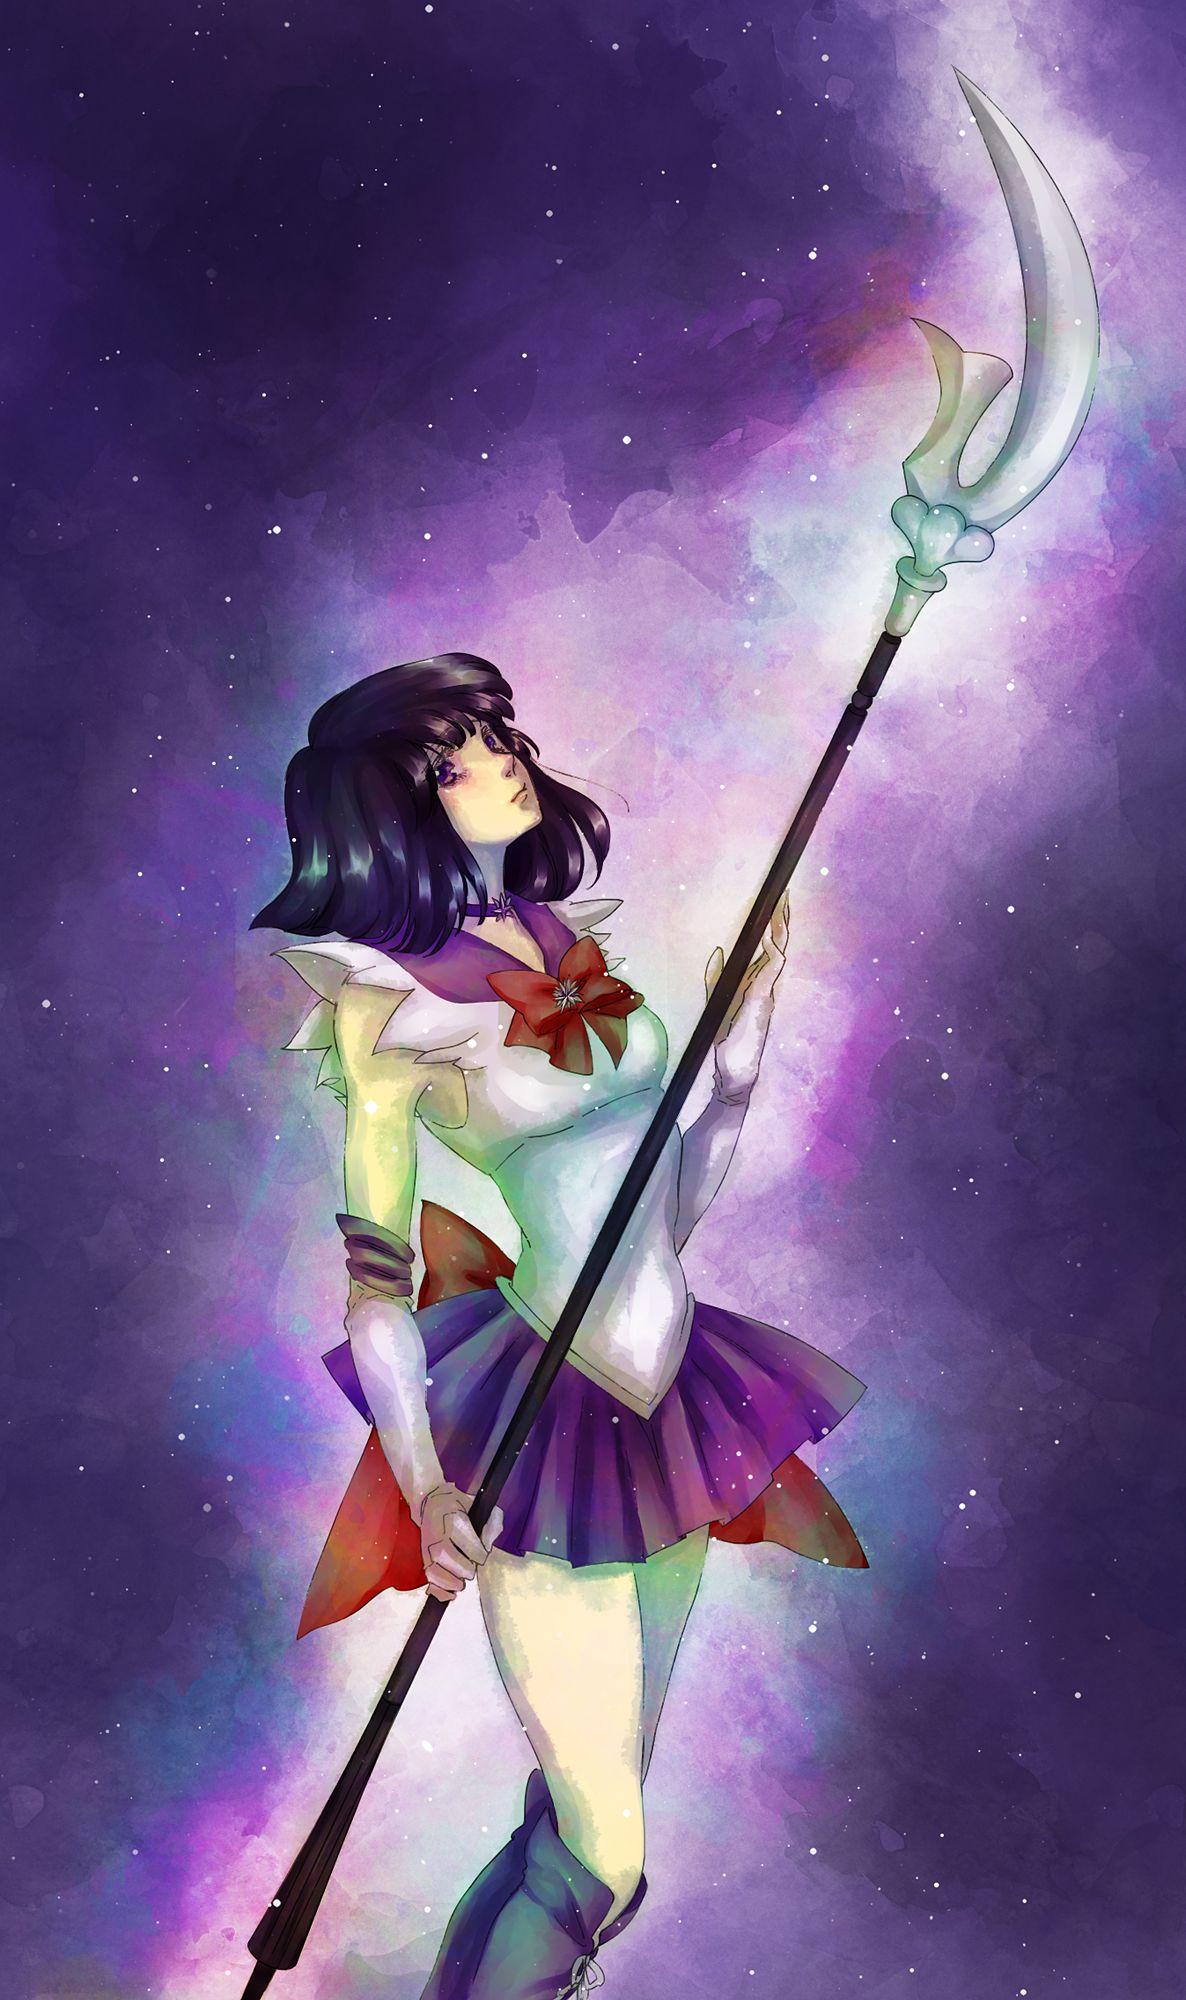 Sailor Saturn | Сэйлор мун, Сейлор мун и Аниме